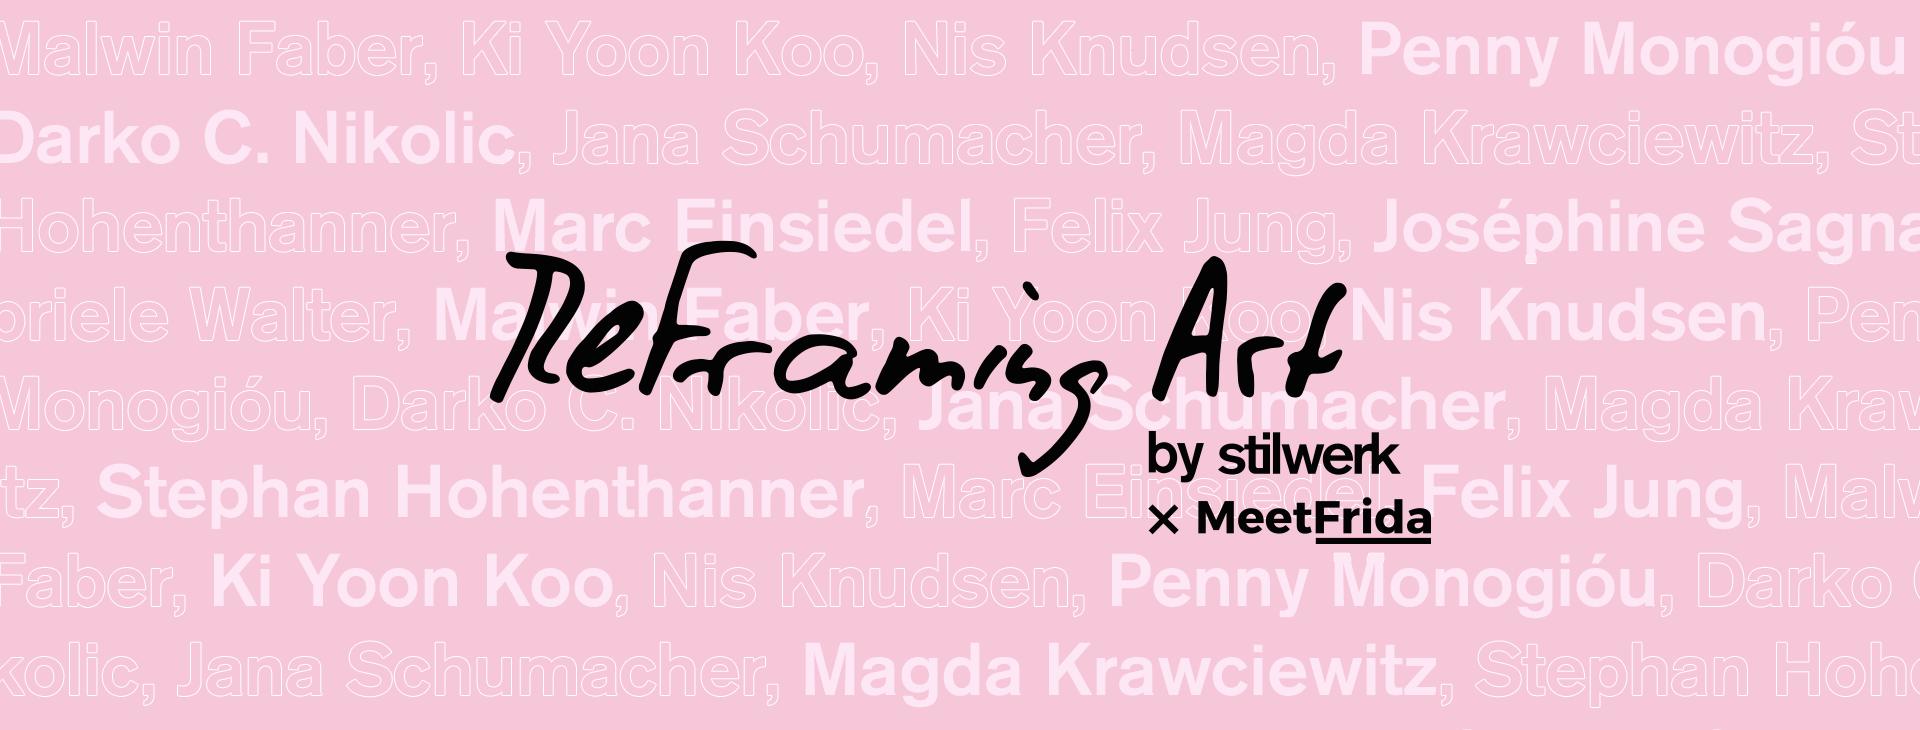 stilwerk_reframing_art_meetfrida_stage_03